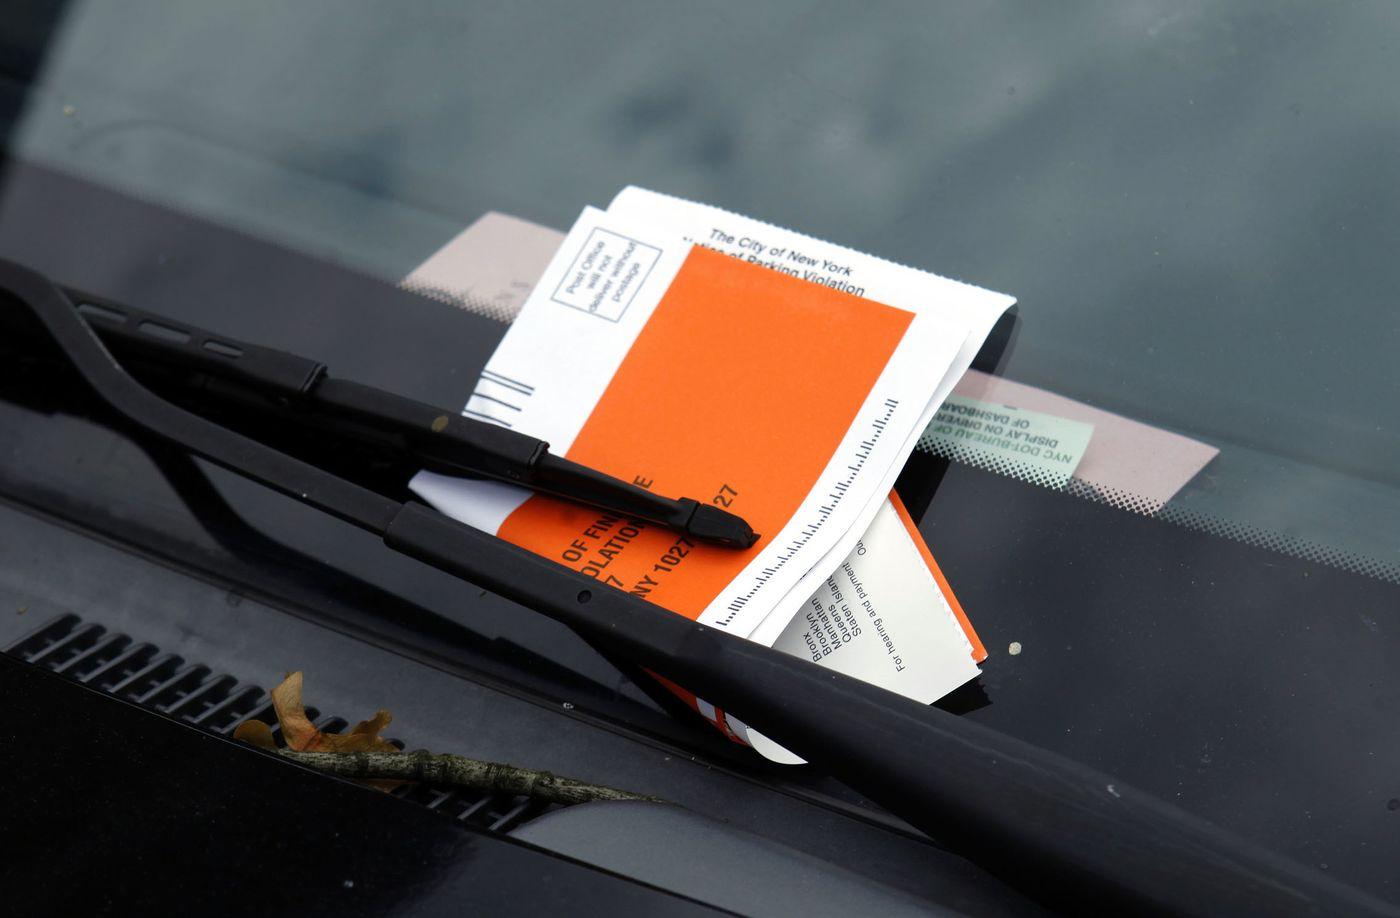 ticket-fixing scandal